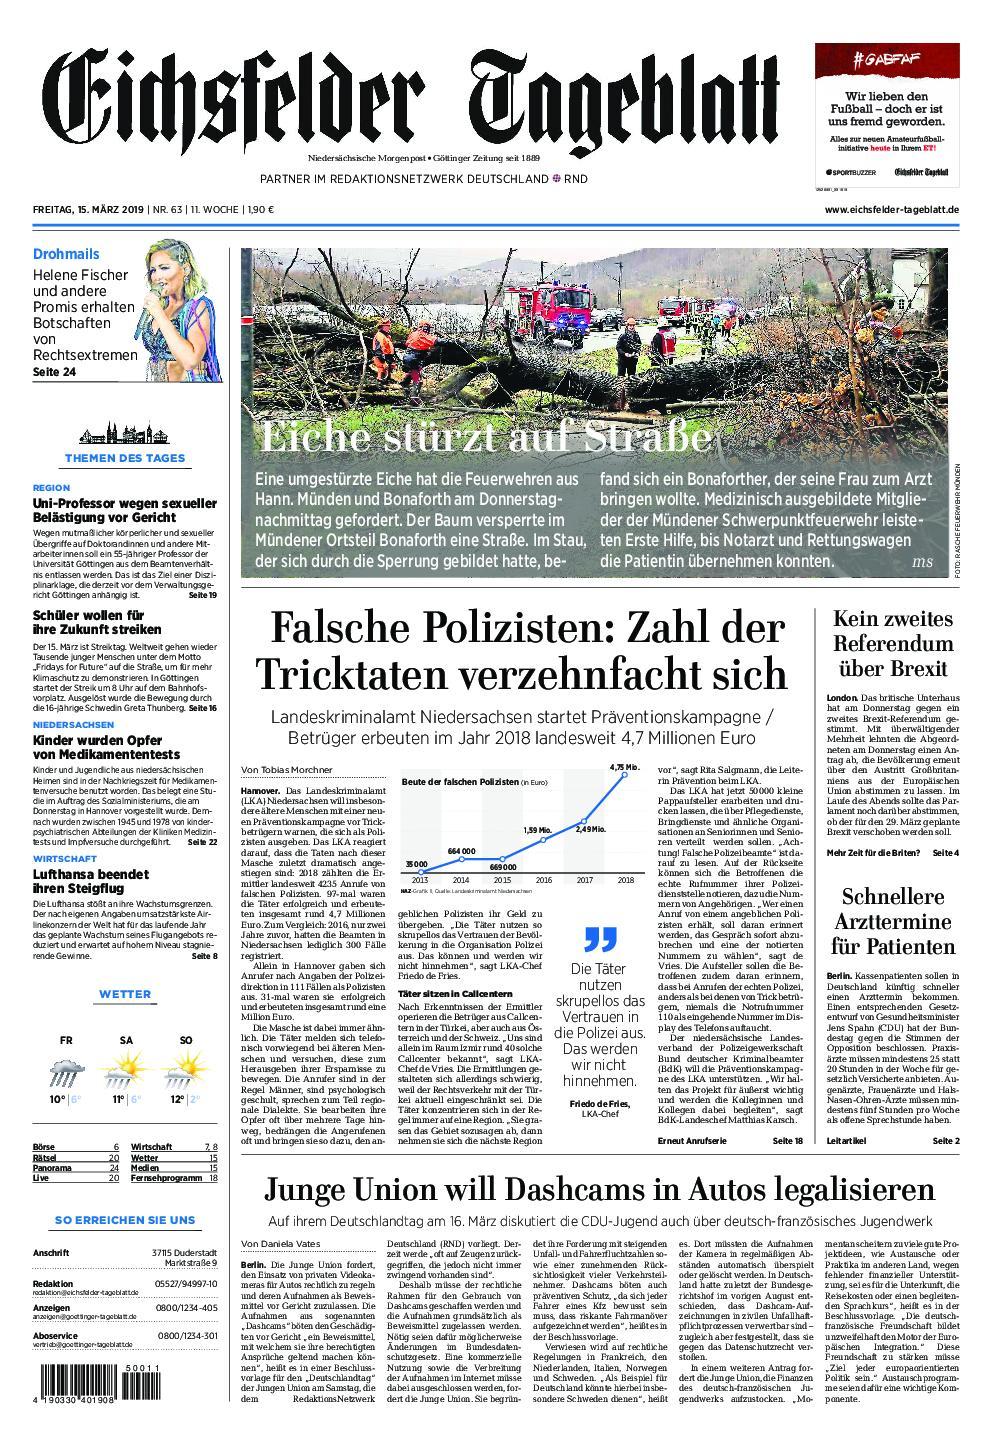 Eichsfelder Tageblatt – 15. März 2019